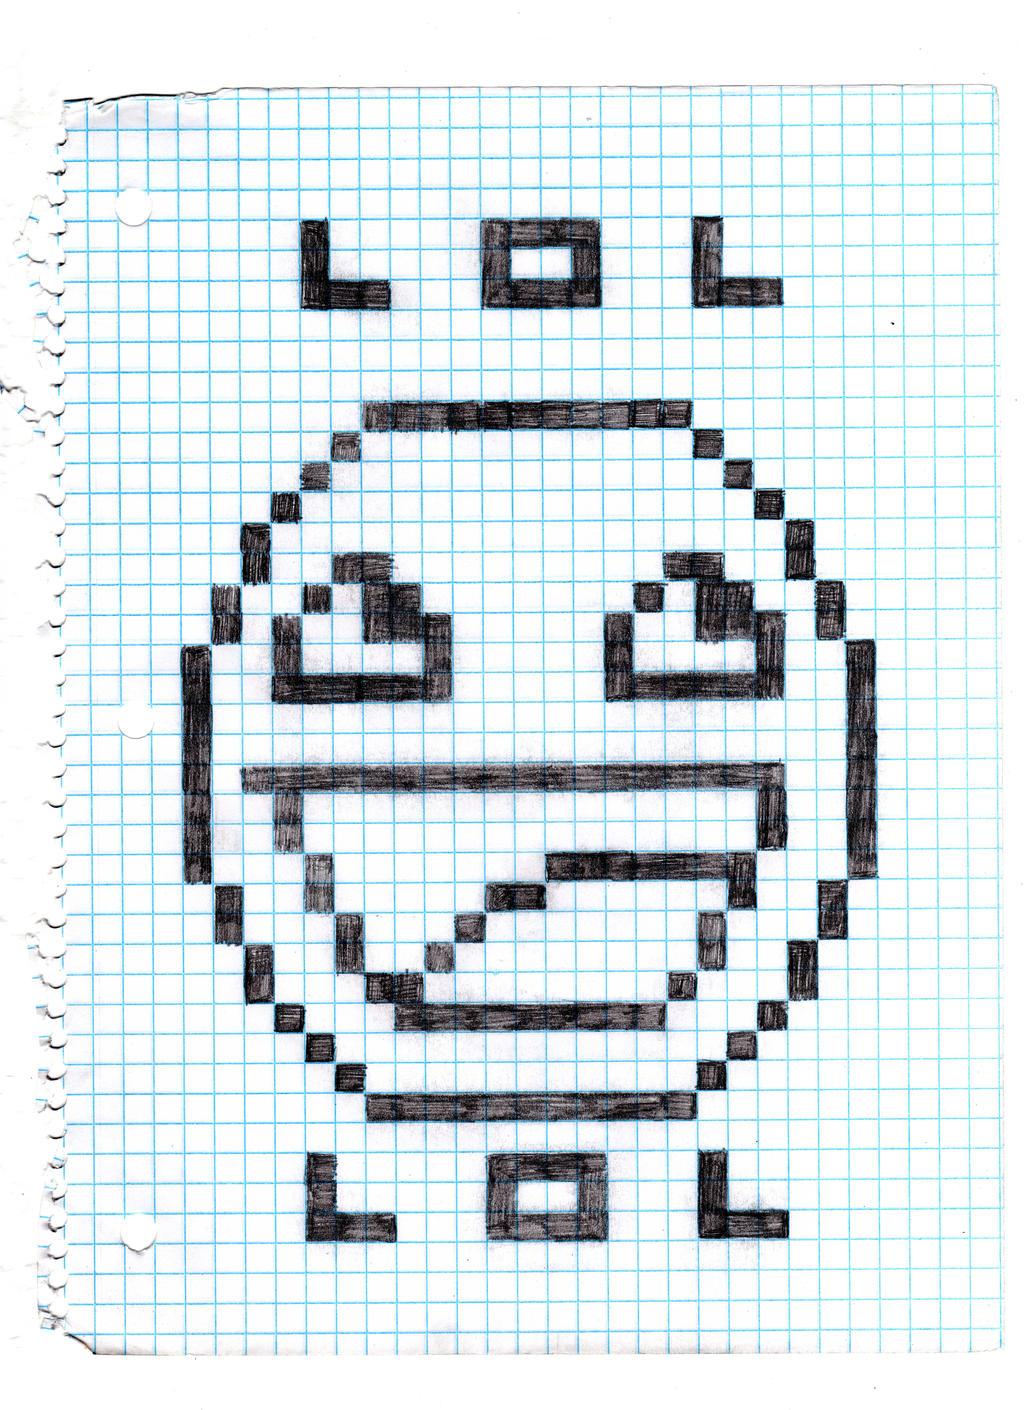 Oh Graph Paper...LOL by Tobienforcer on DeviantArt